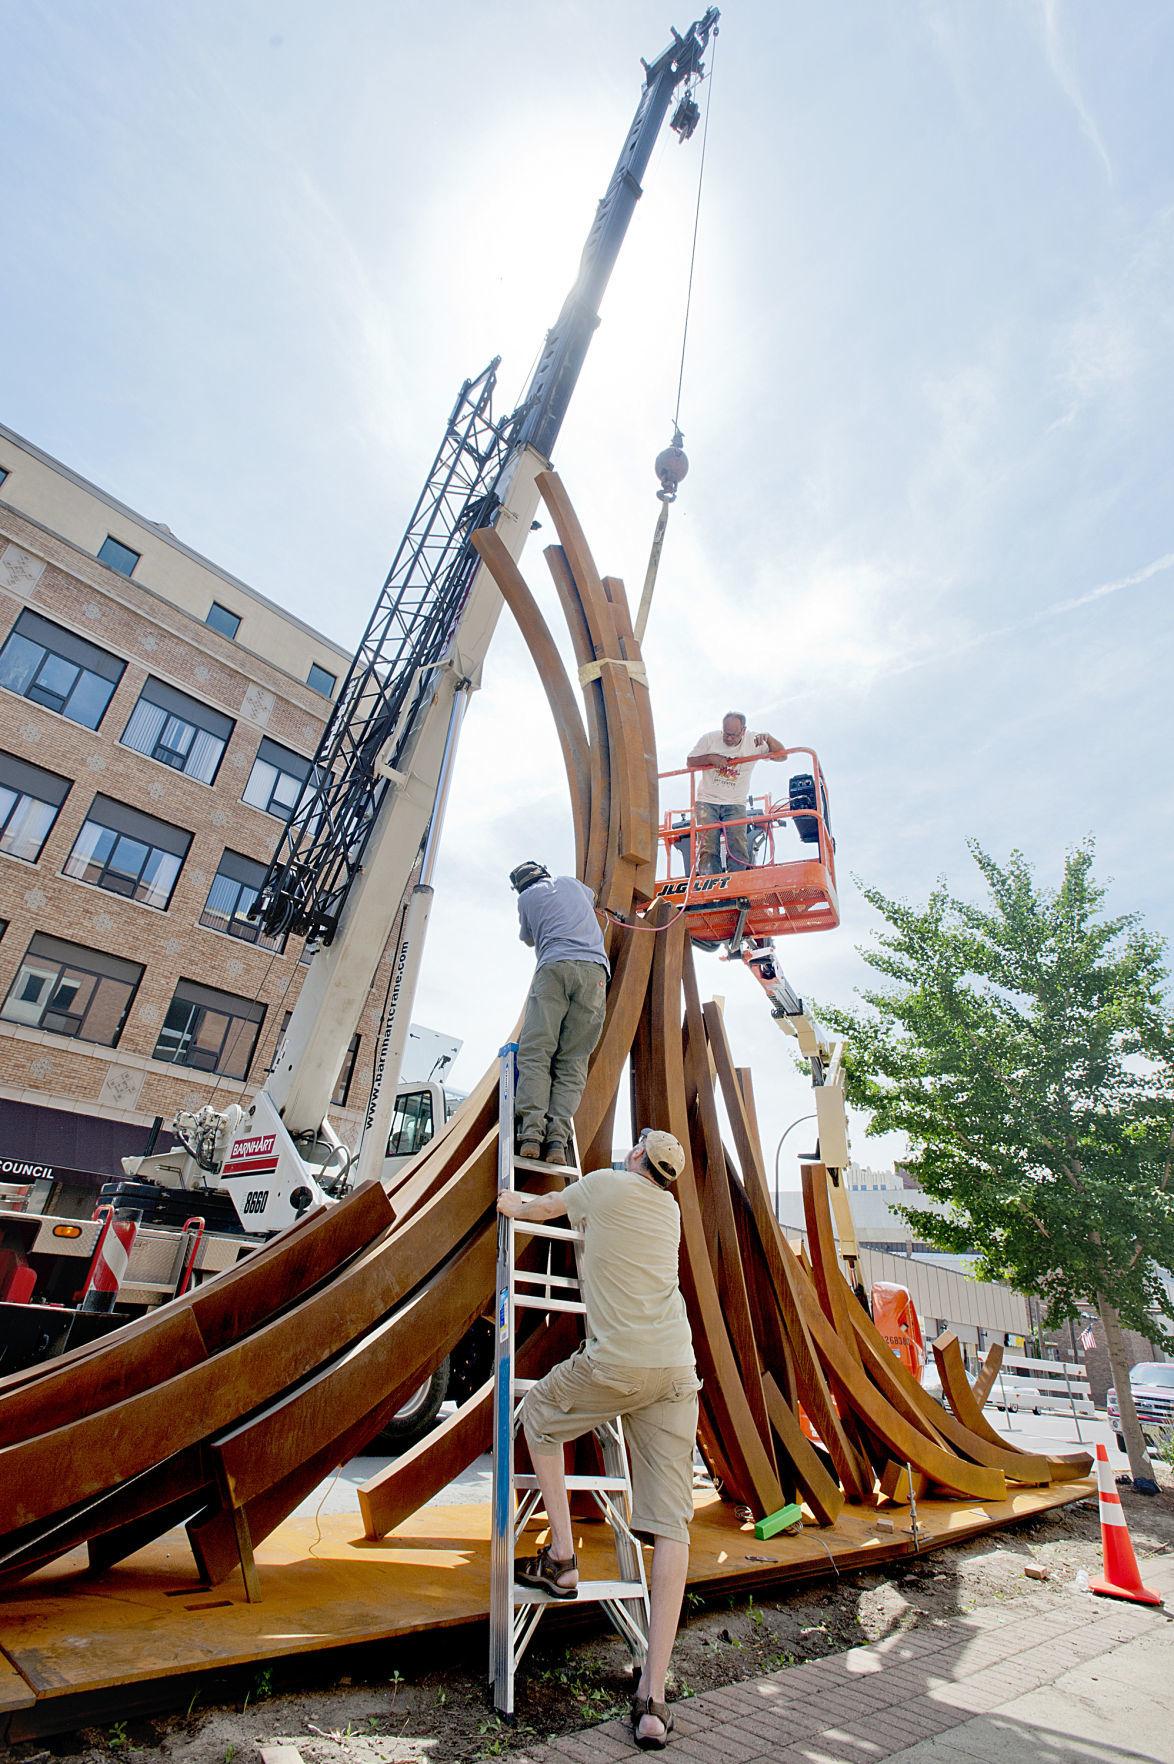 Celebrating Community Sculpture